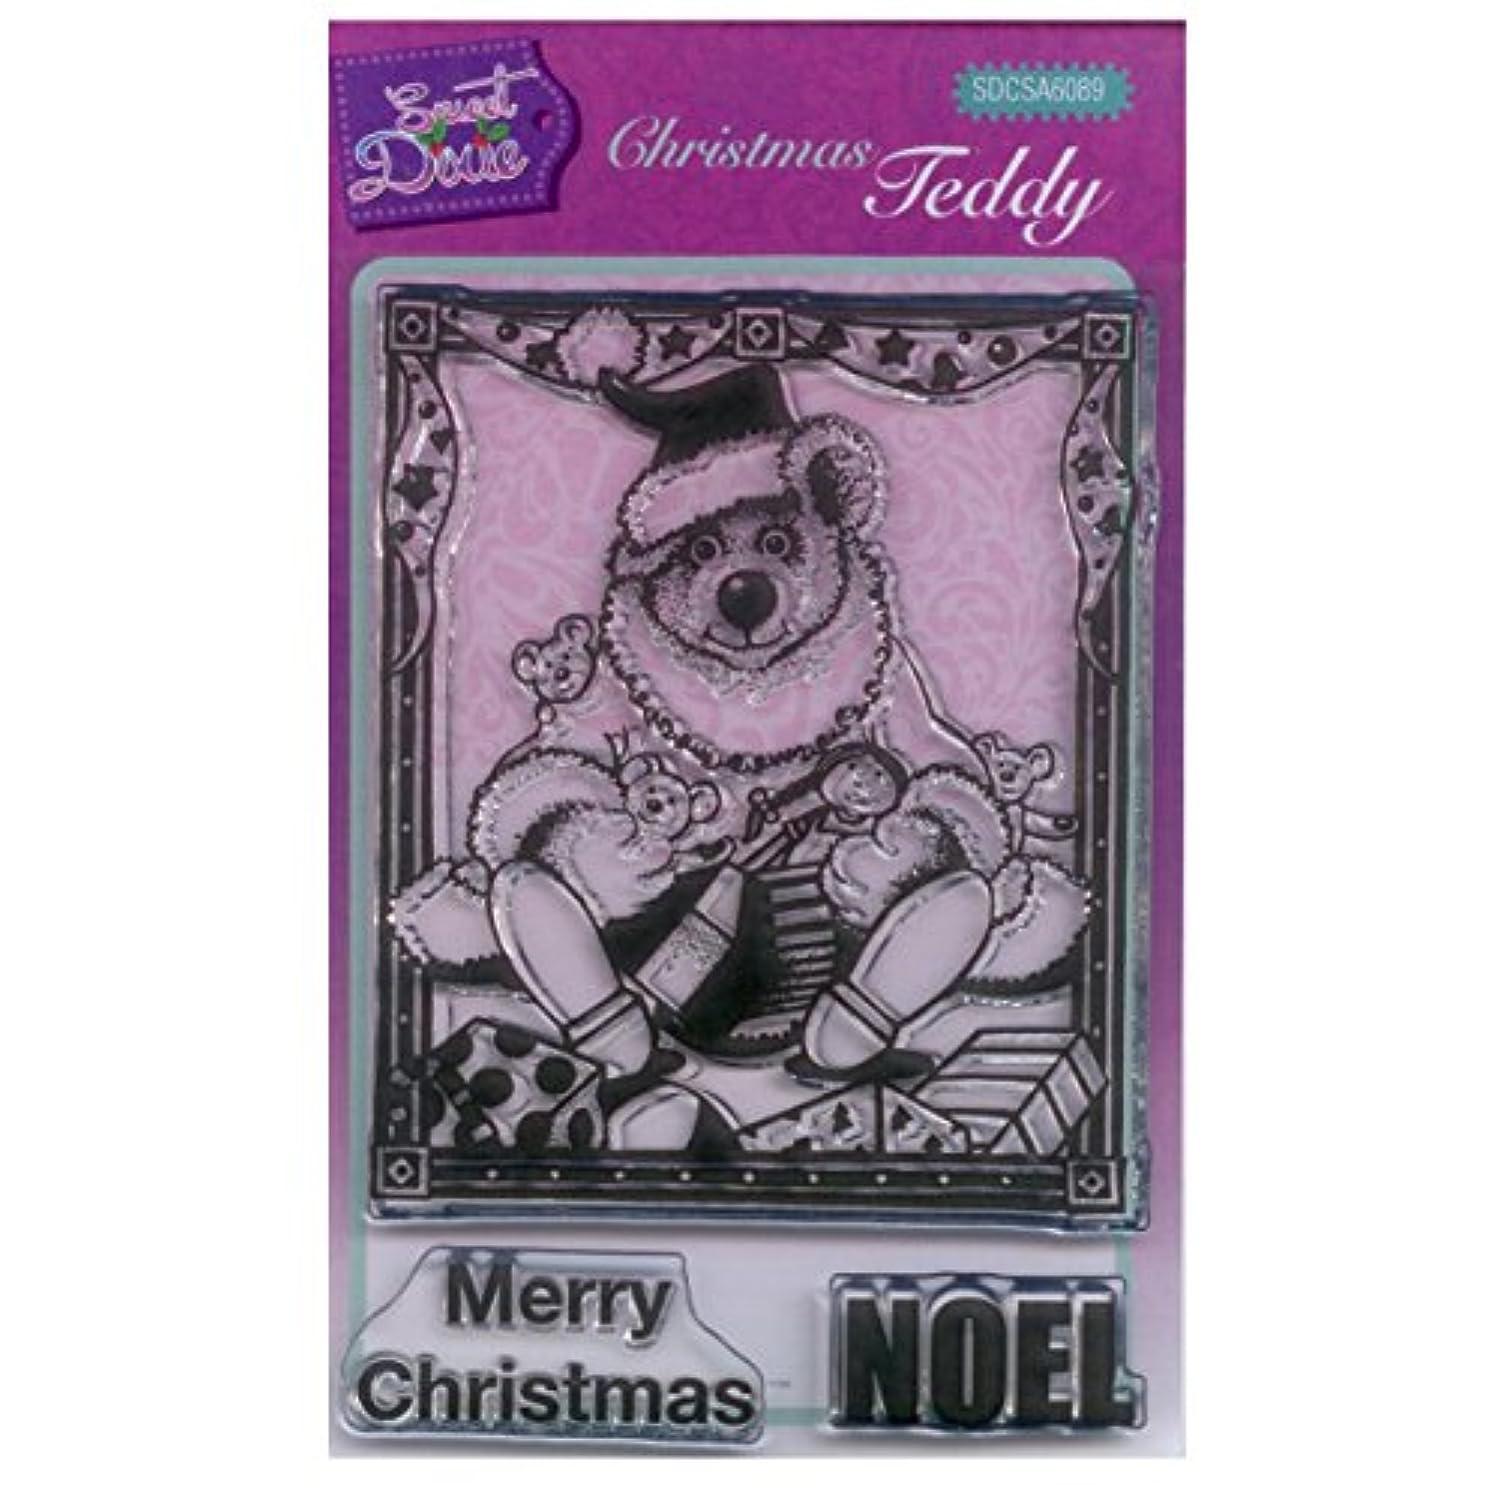 Sweet Dixie A6 Clear Stamp Set - SDCSA6089 Christmas Teddy